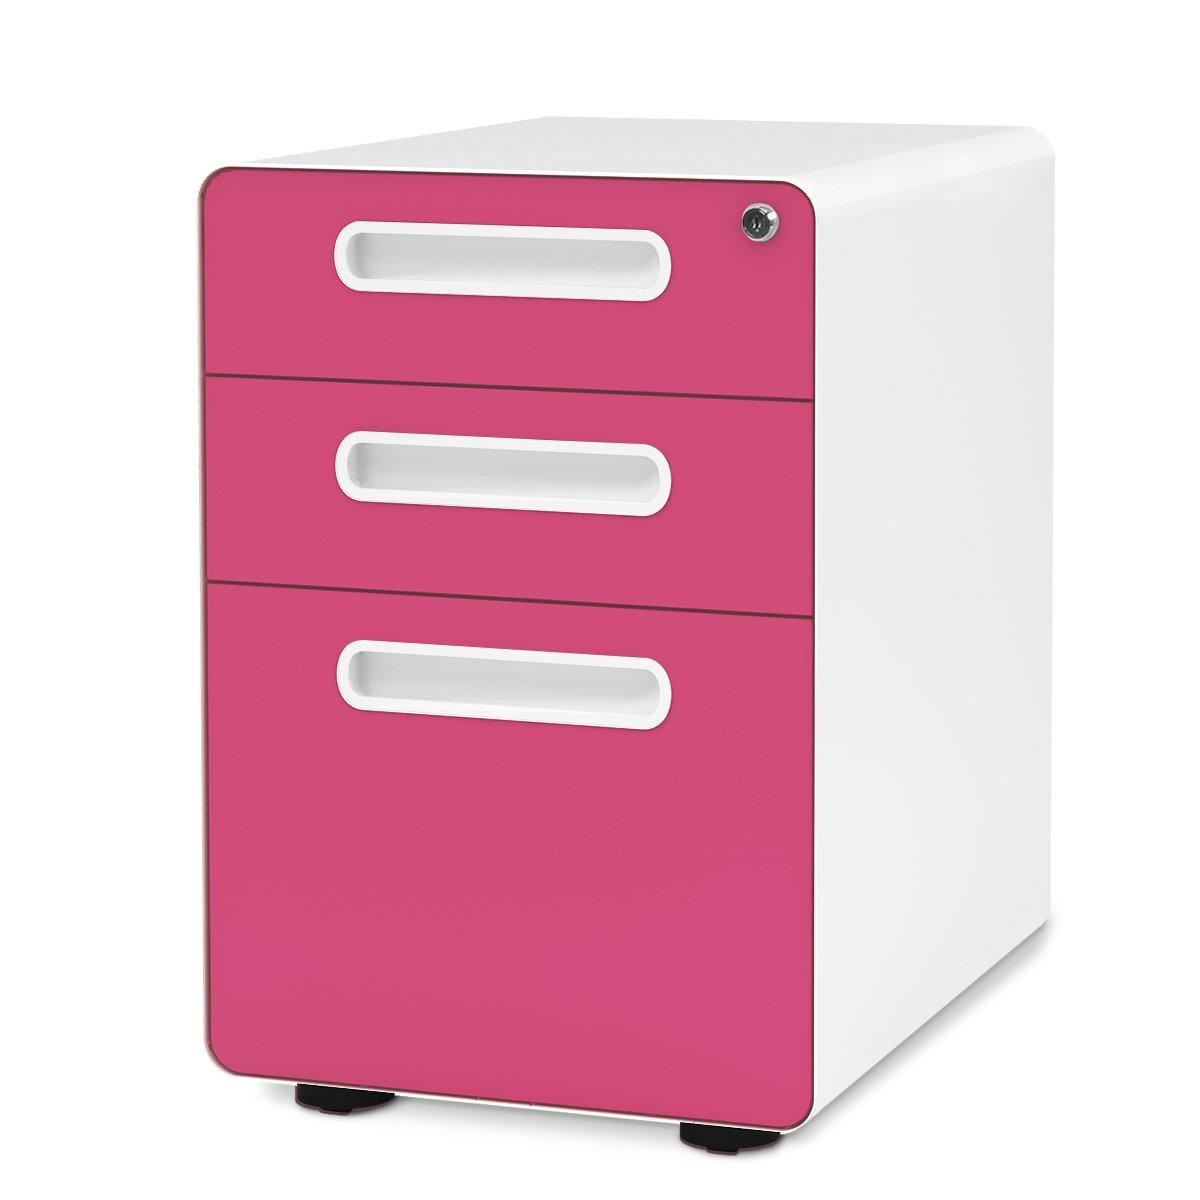 DEVAISE 3-Drawer Mobile File Cabinet with Anti-tilt Mechanism,Legal/Letter Size (Blue) PCSCBLU53